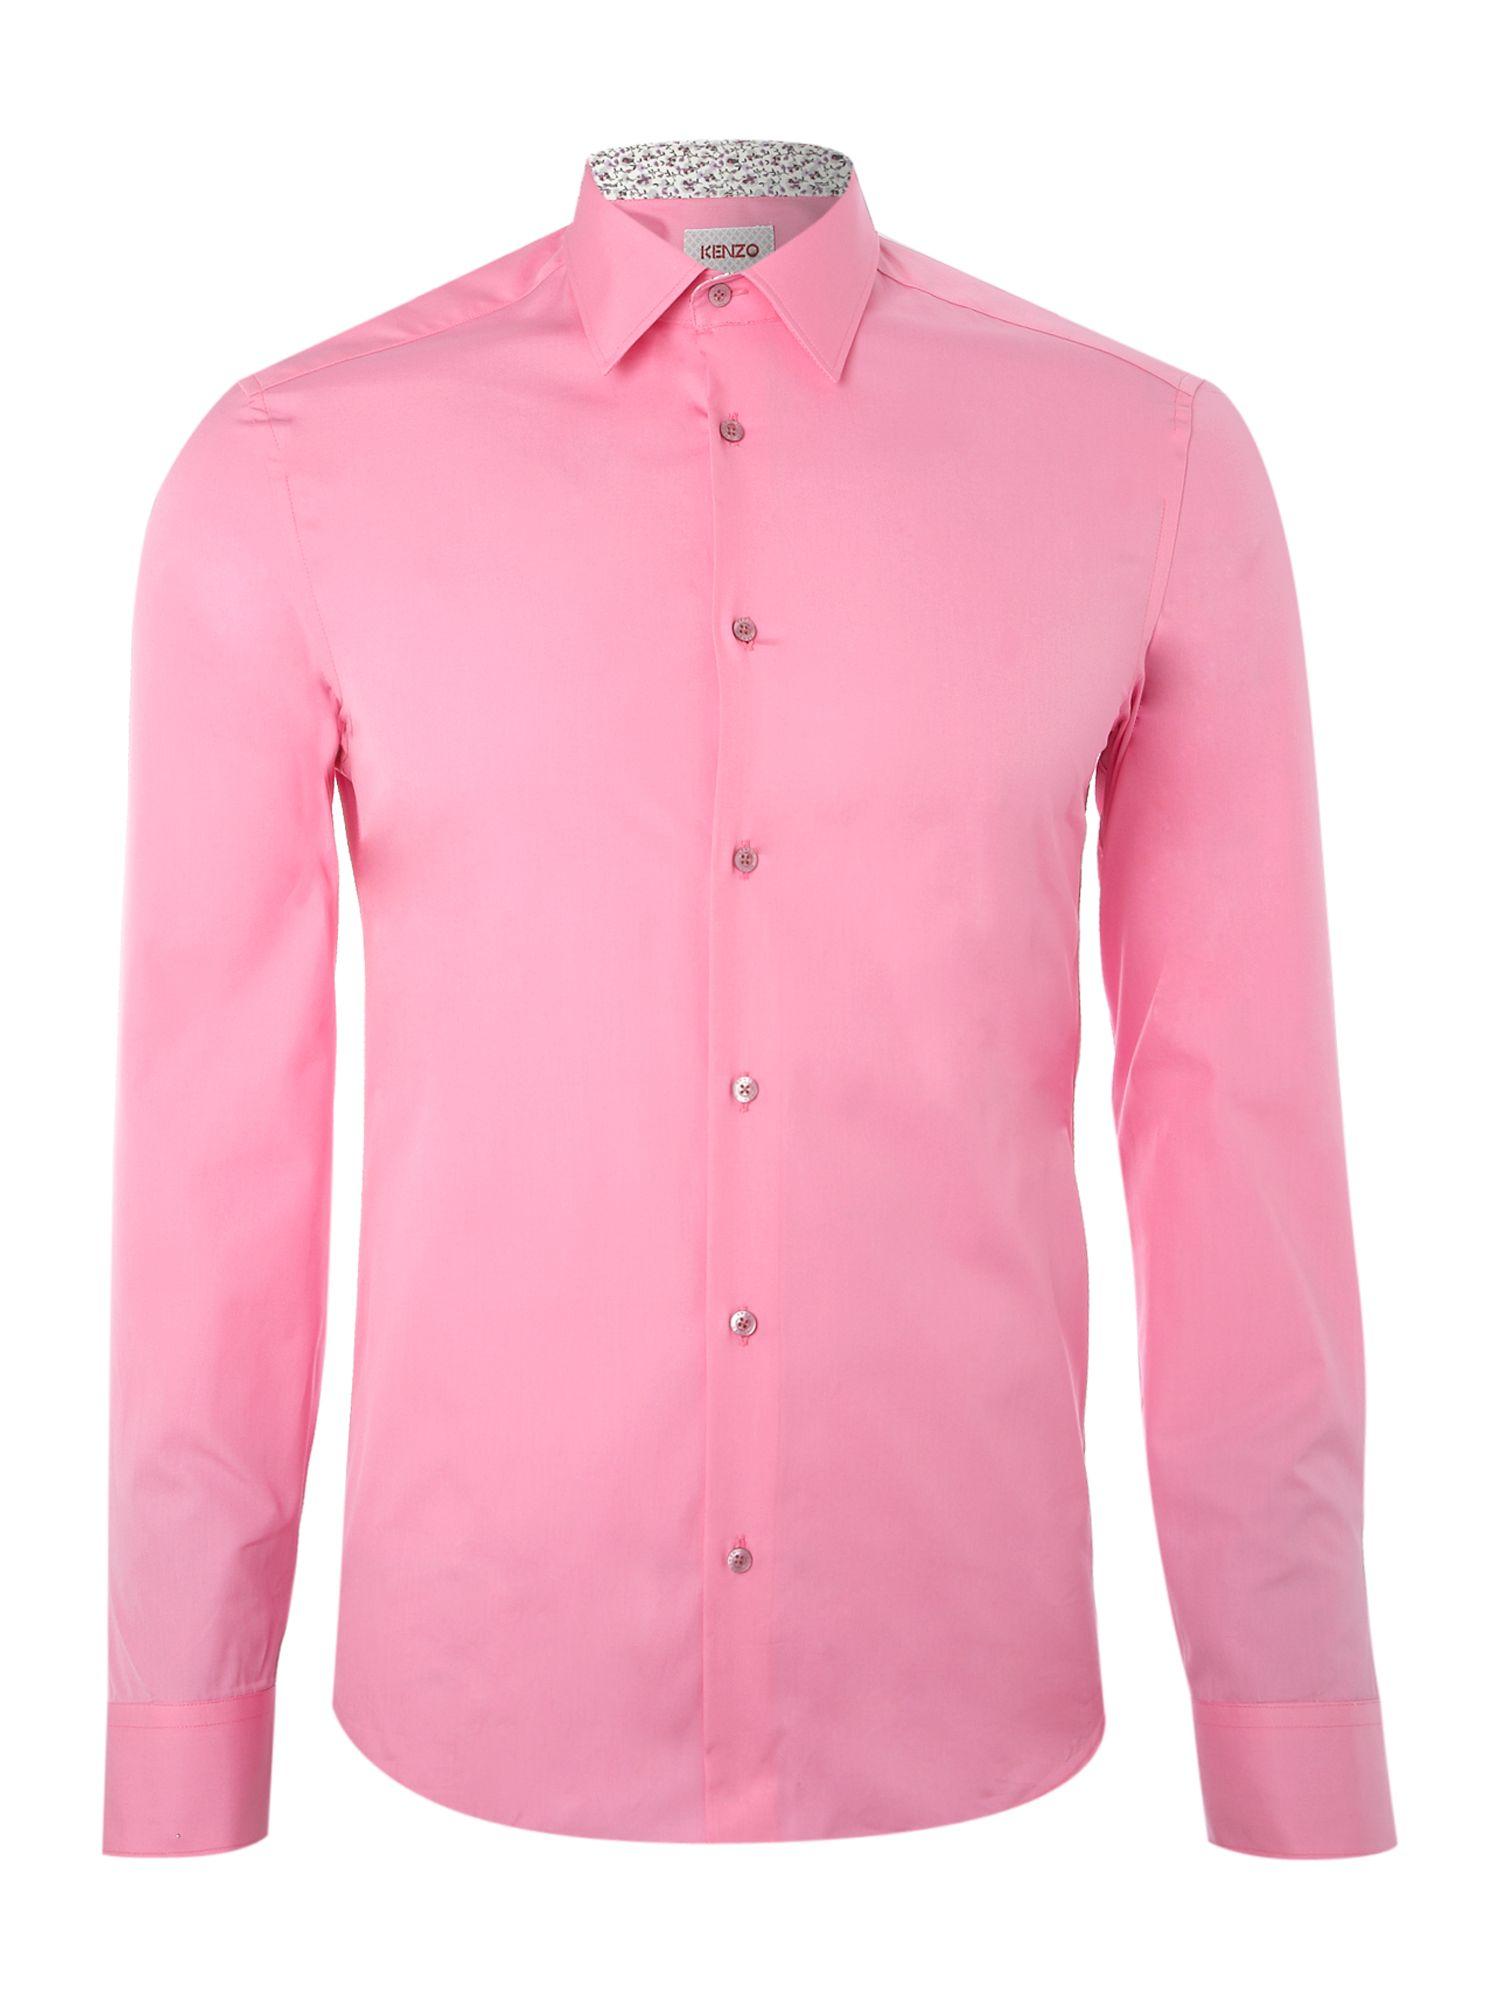 Kenzo Long Sleeven Bright Poplin Shirt in Pink for Men | Lyst